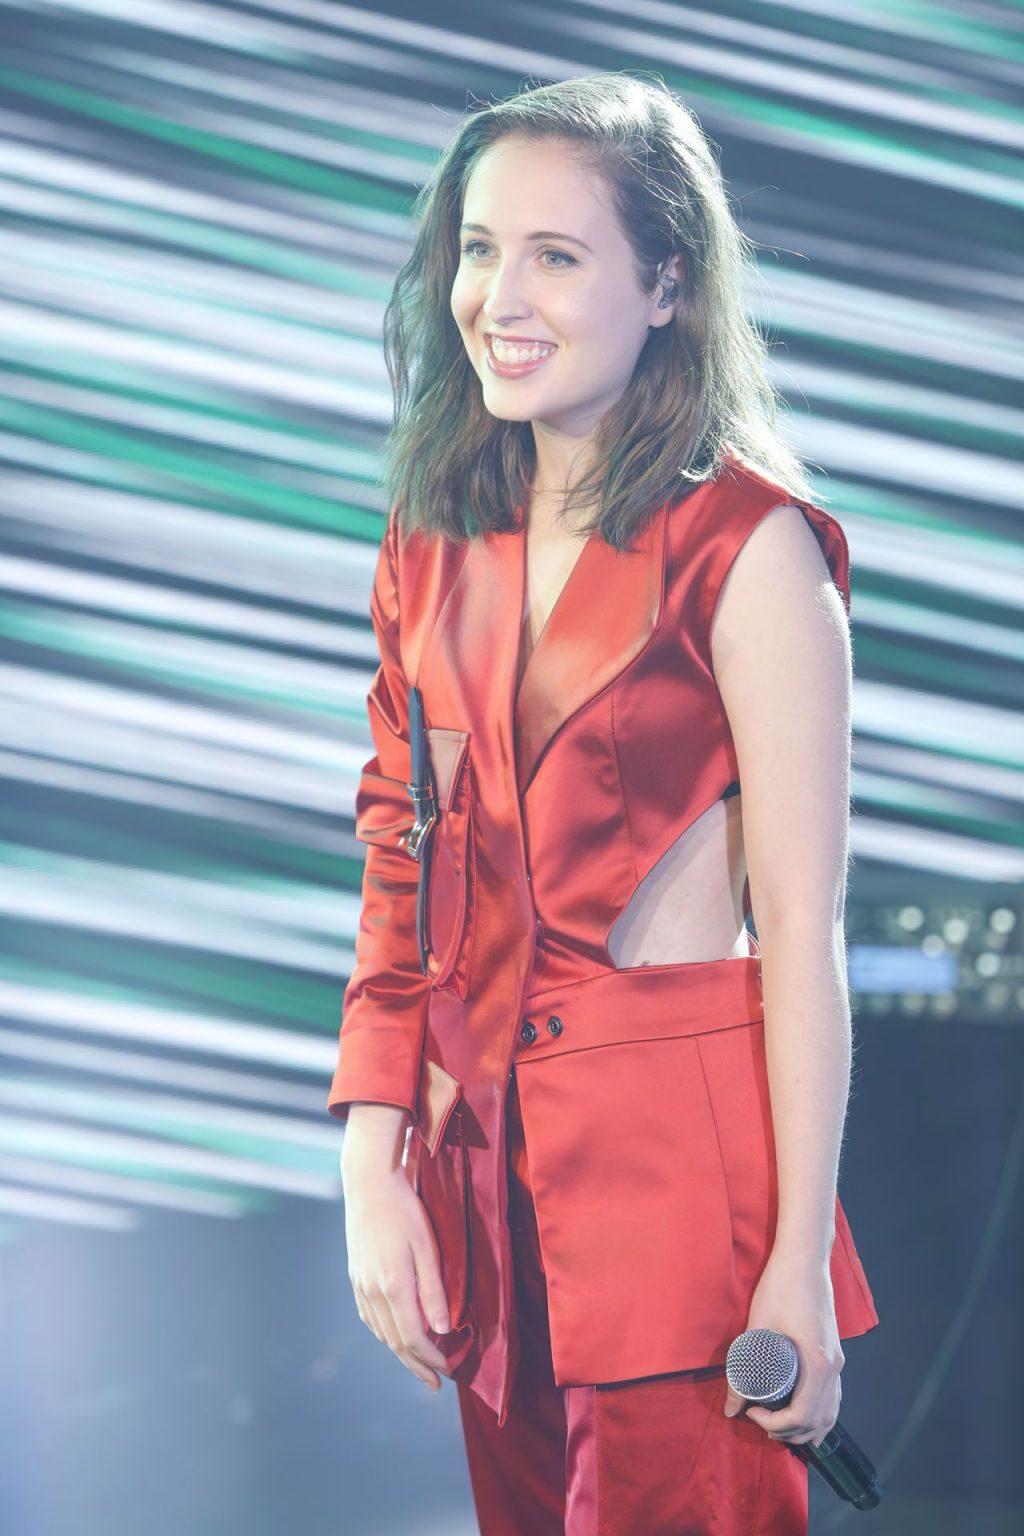 Jennifer lopez naked leaked - Thefappening.pm - Celebrity